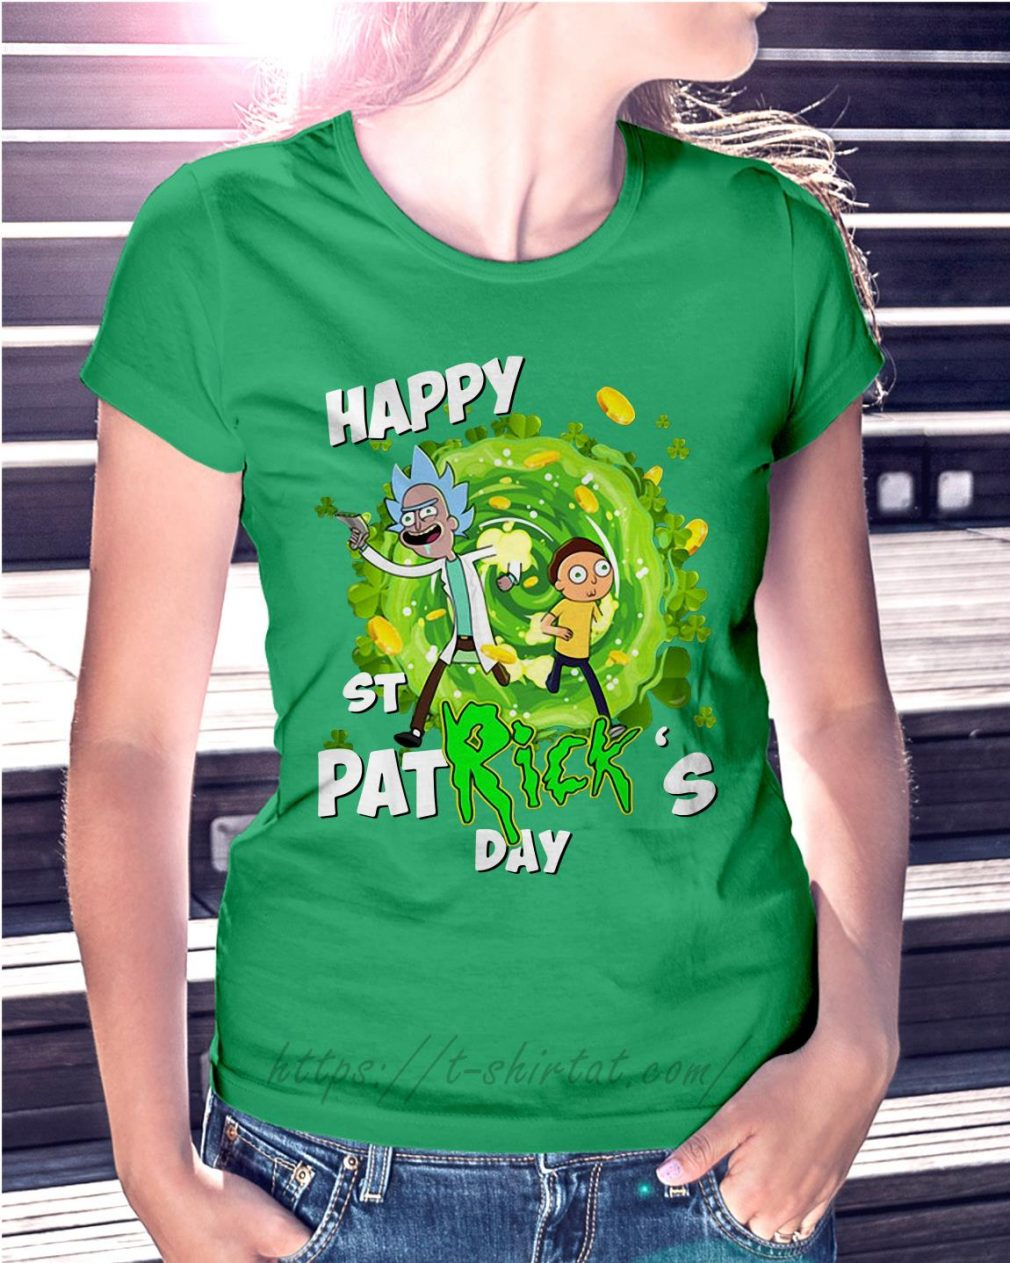 Happy St PatRick's day Rick Sanchez Ladies Tee green